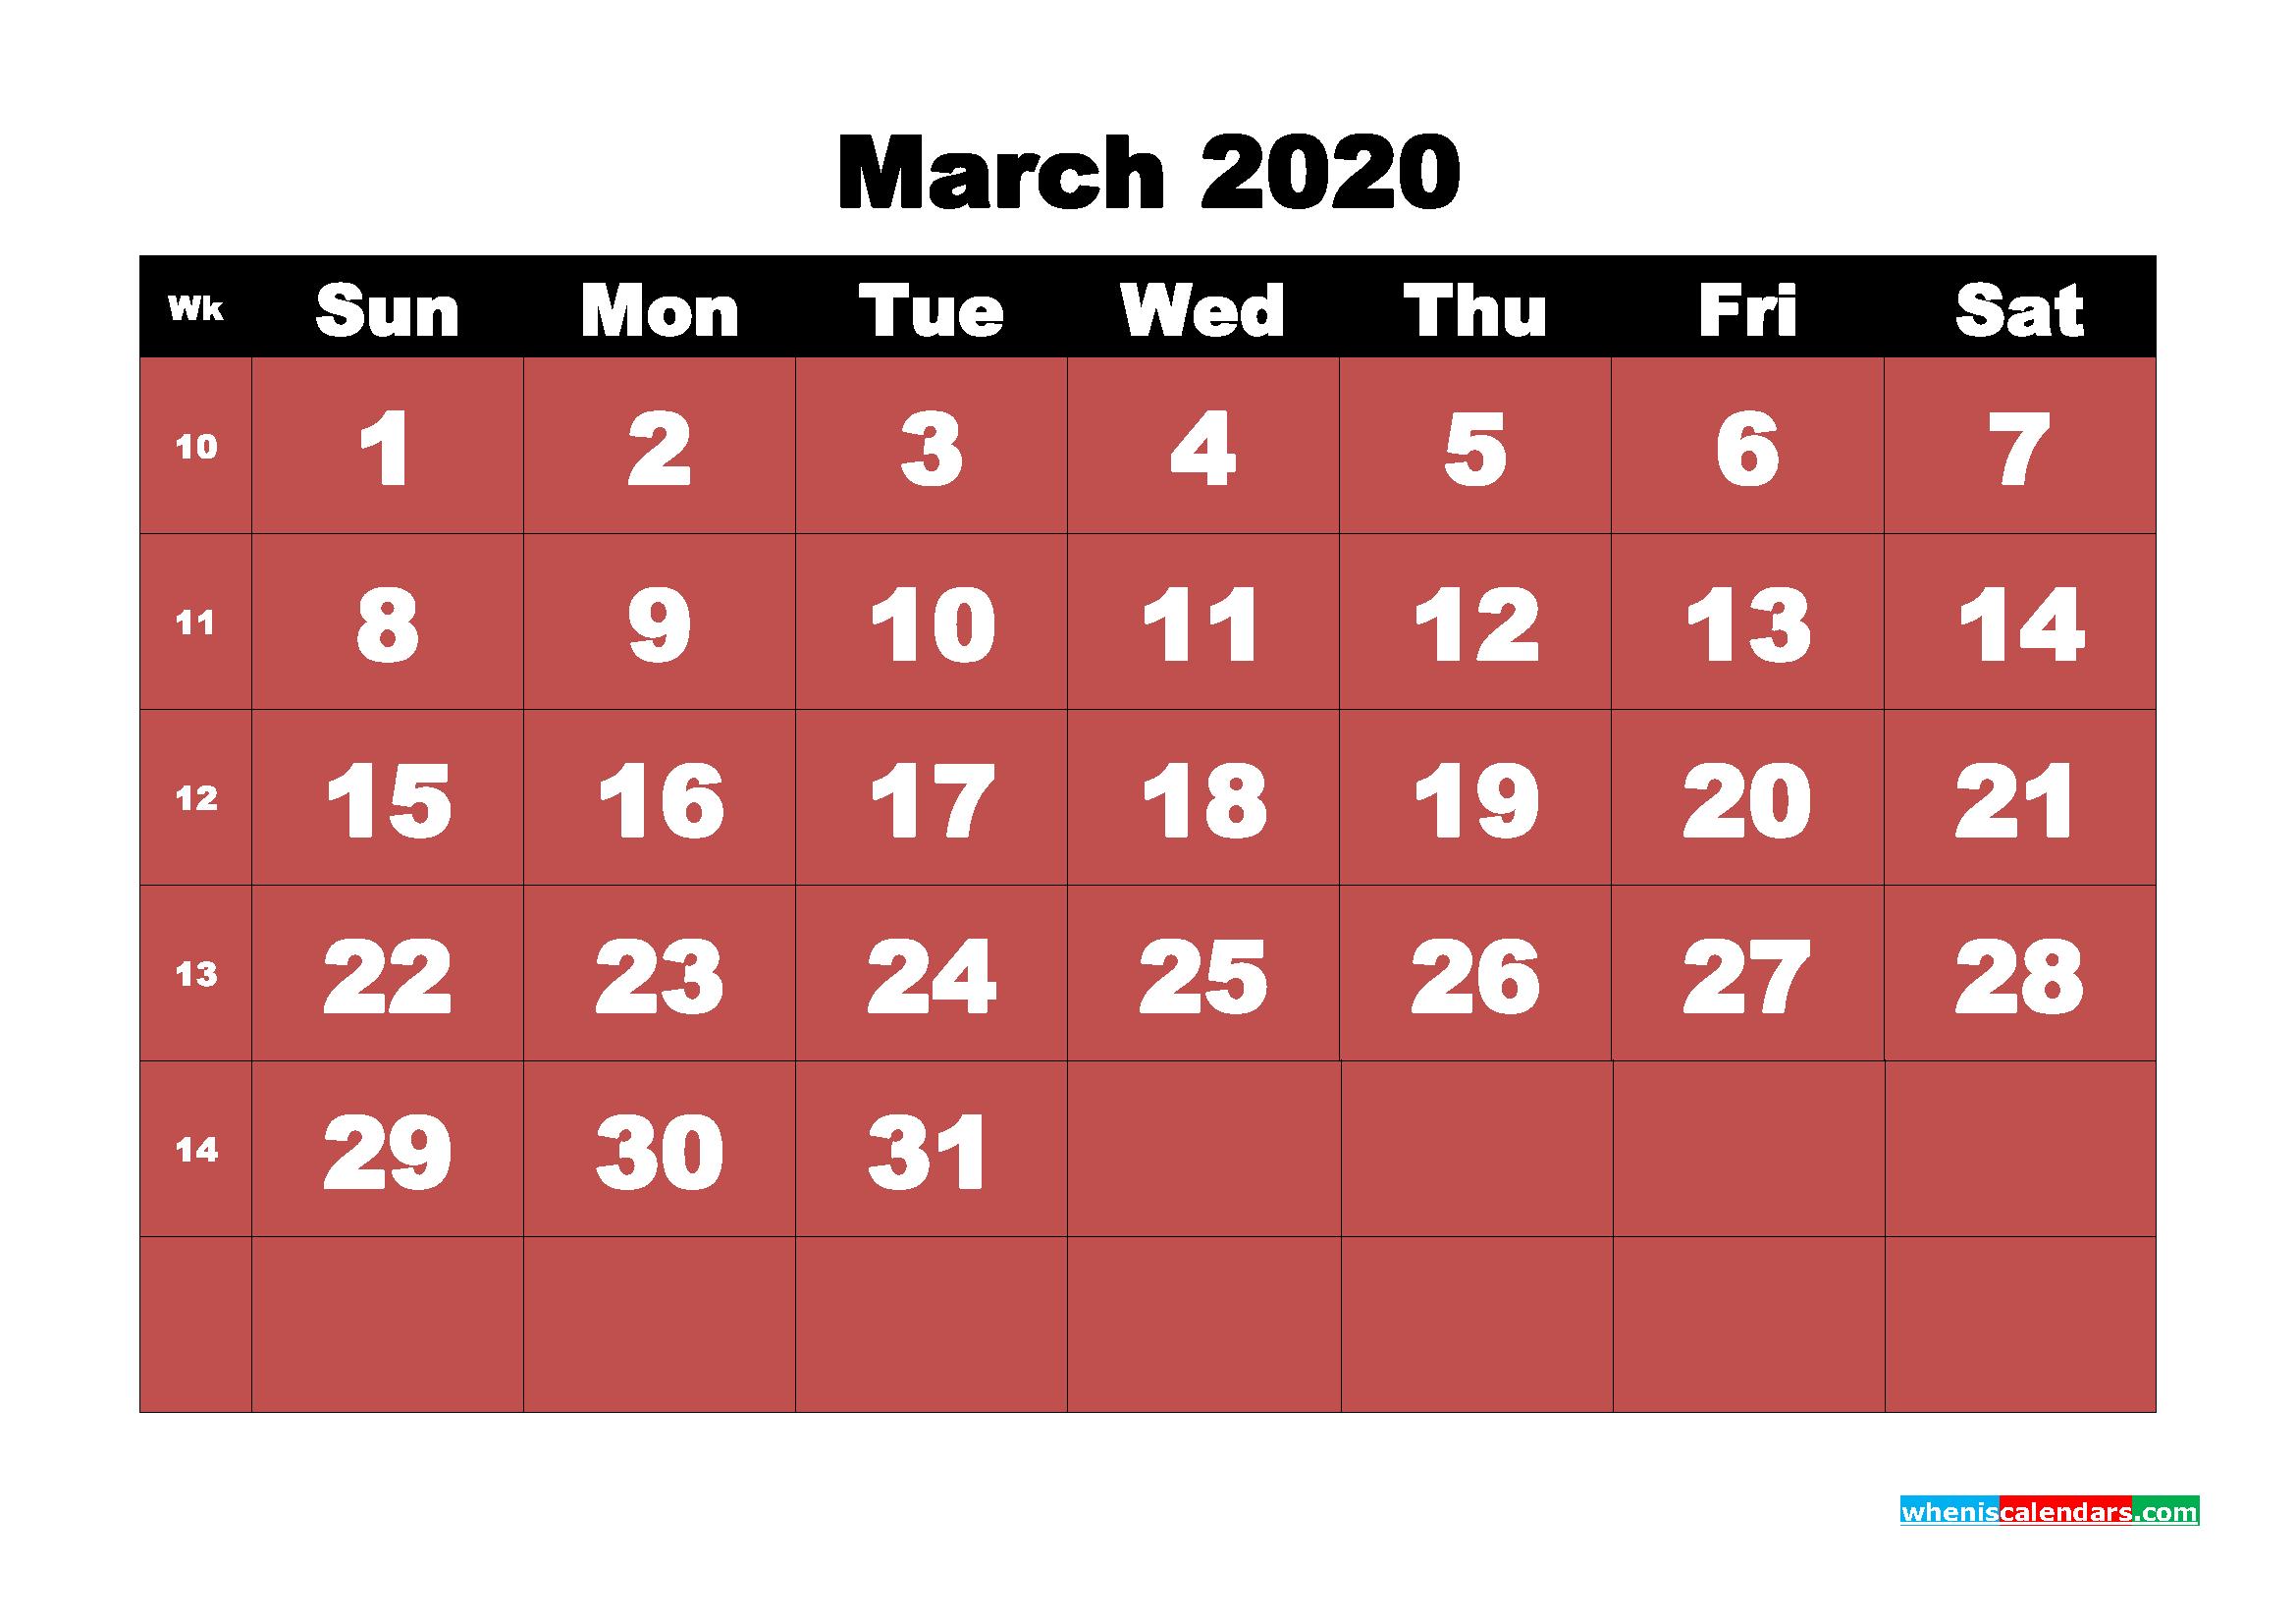 March Printable Calendar 2020 PDF, Word - No.m20b15